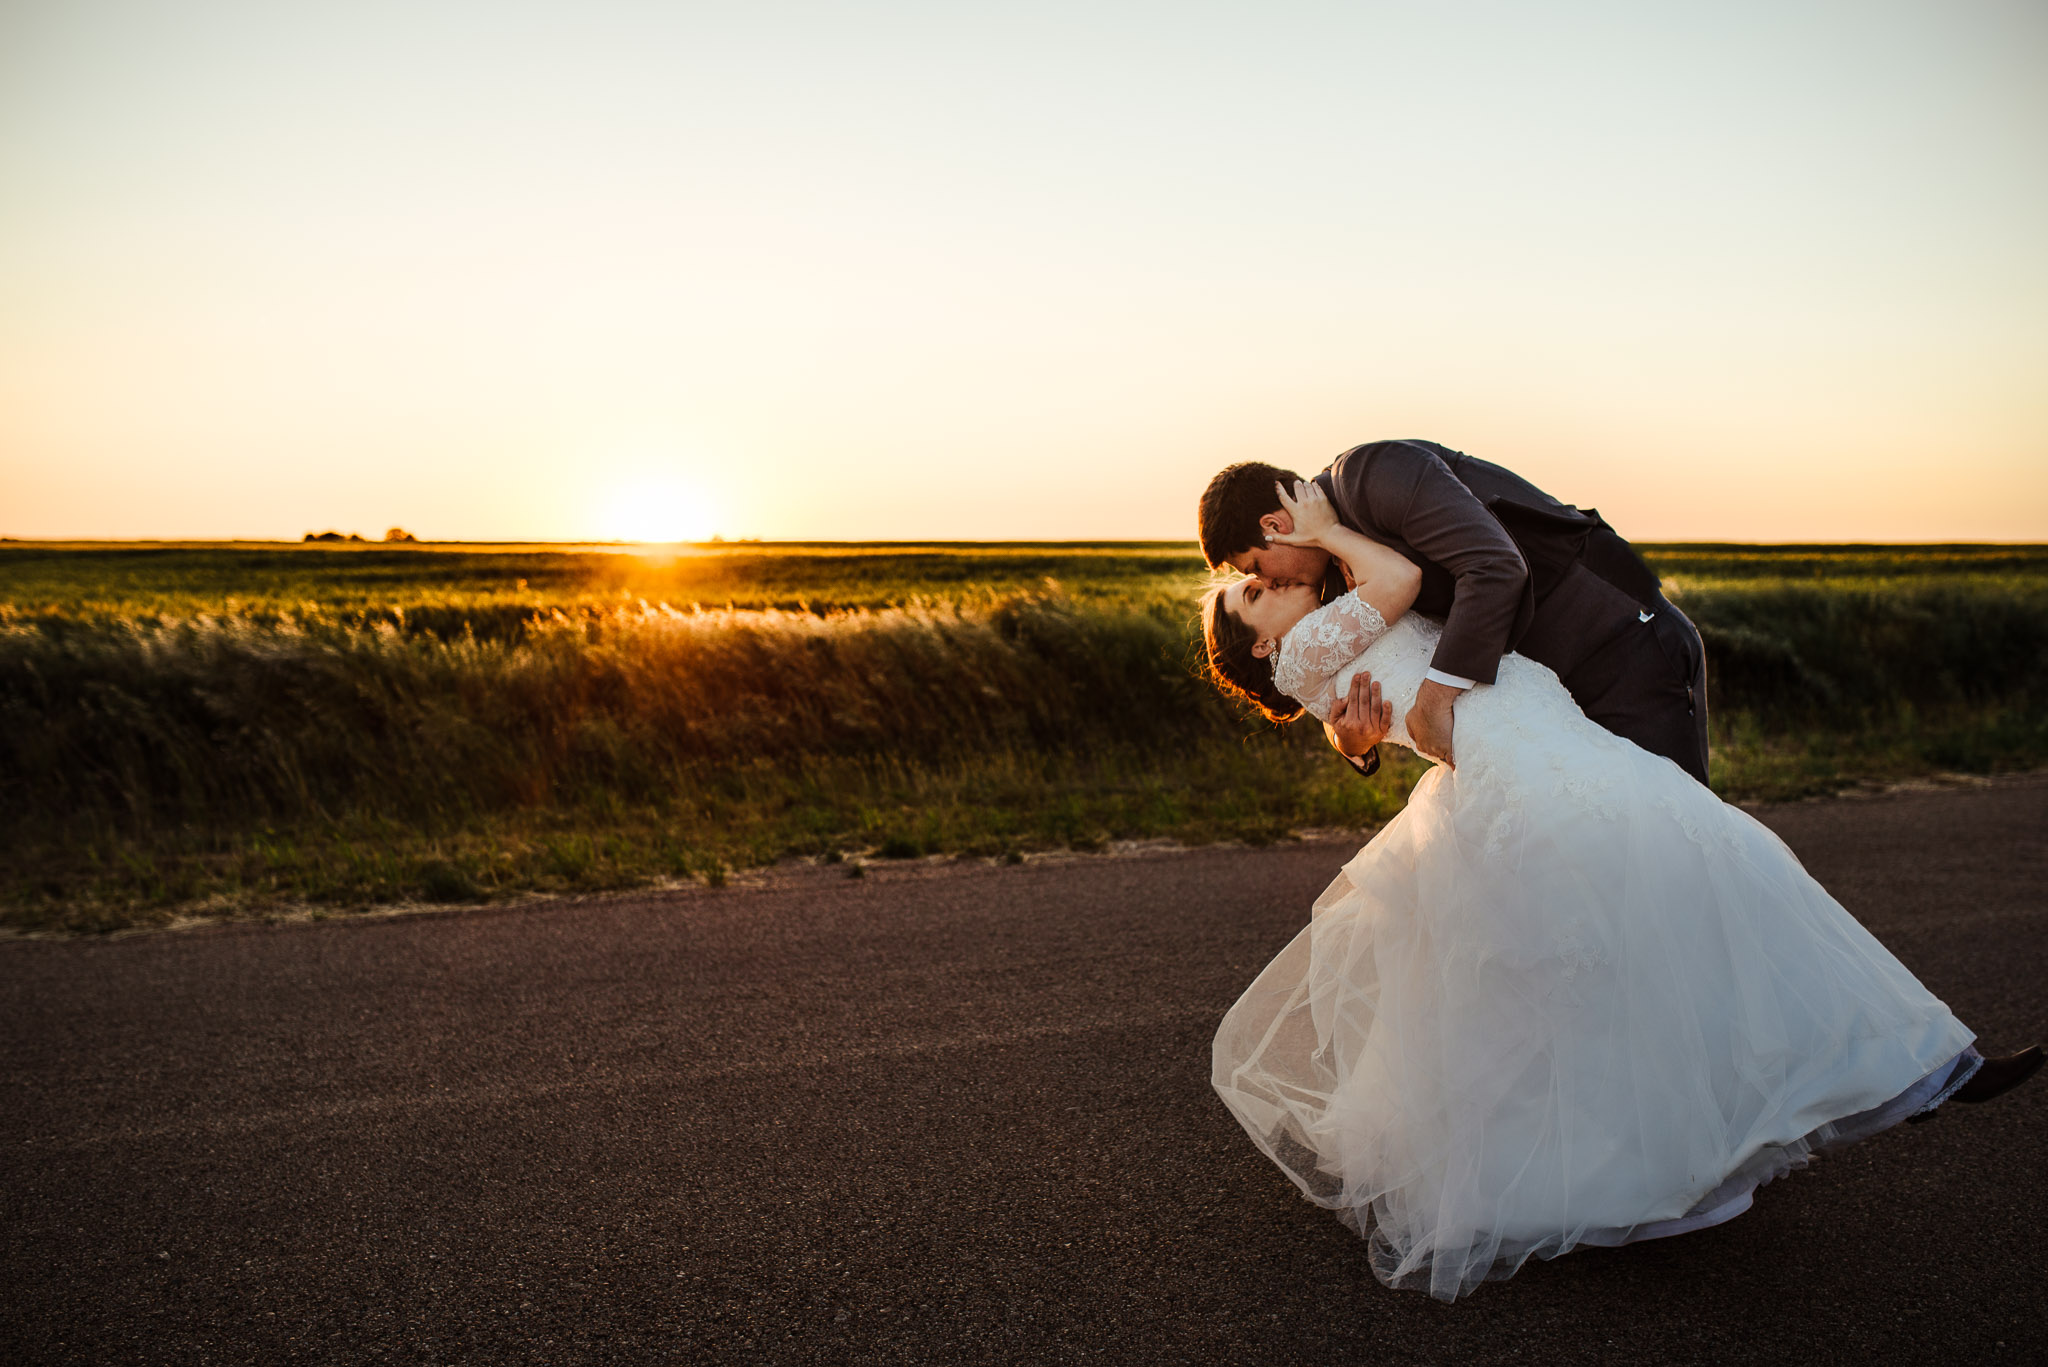 West-Texas-Wedding-Photographer-0029.jpg